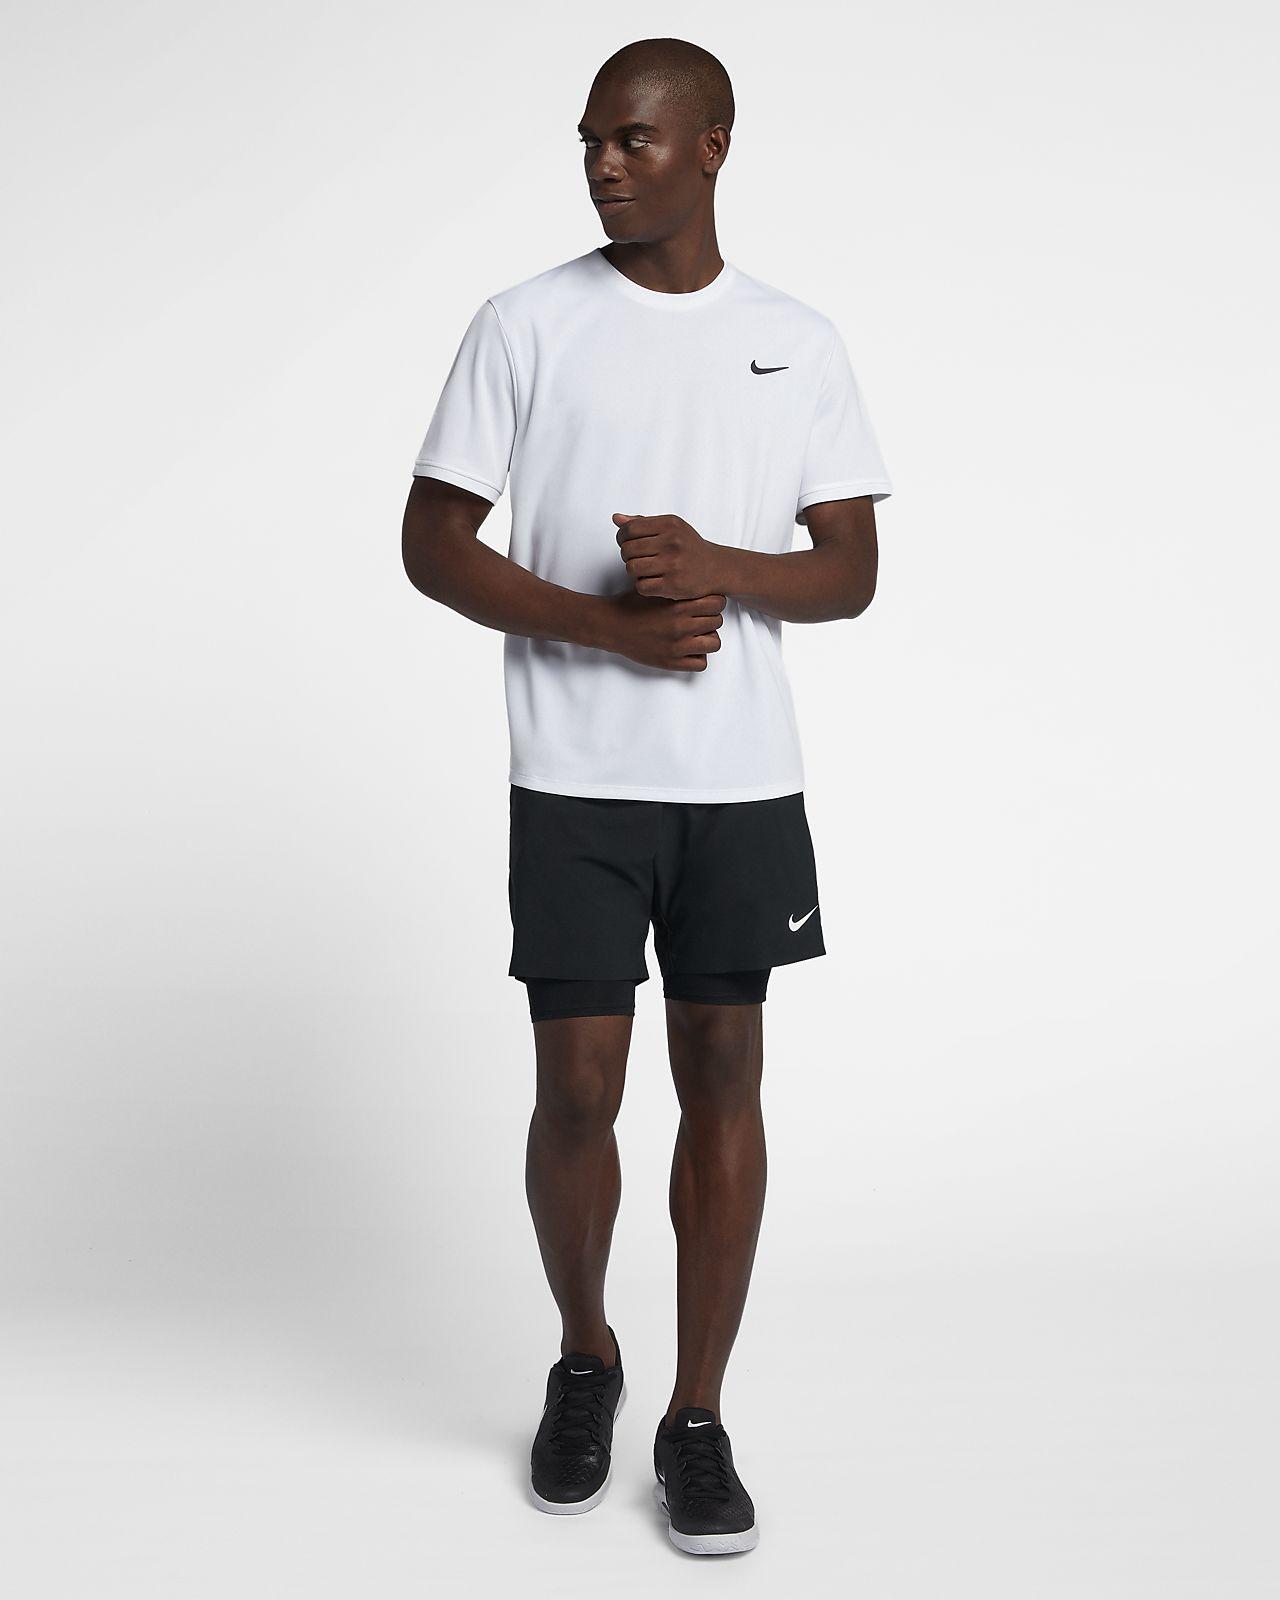 NikeCourt Dri FIT Men's Short Sleeve Tennis Top